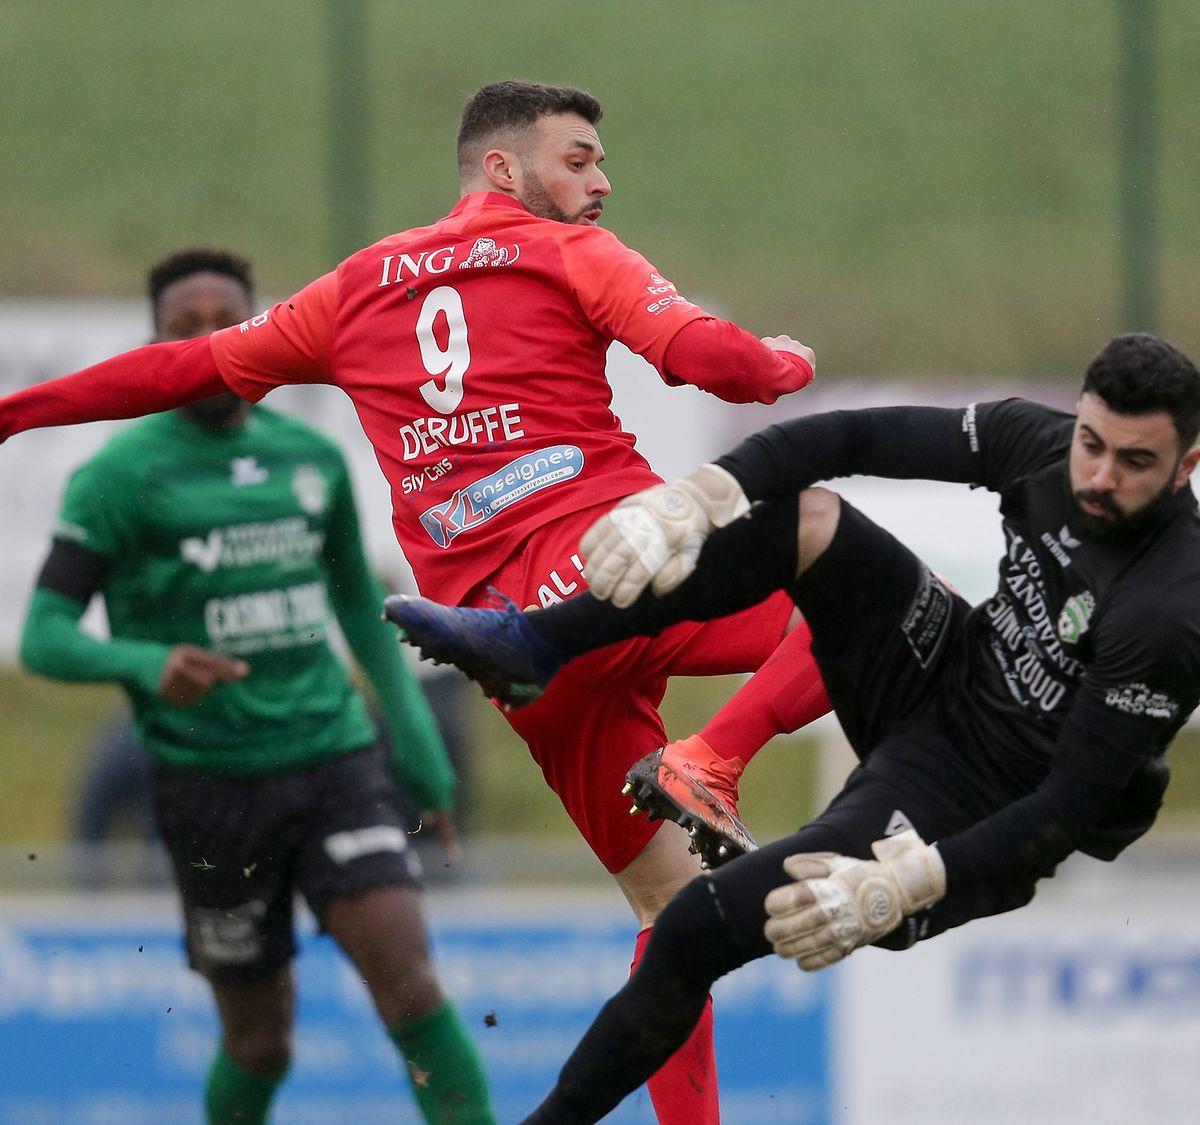 Le Differdangeois Maxime Deruffe face au portier mondorfois Koray Özcan.